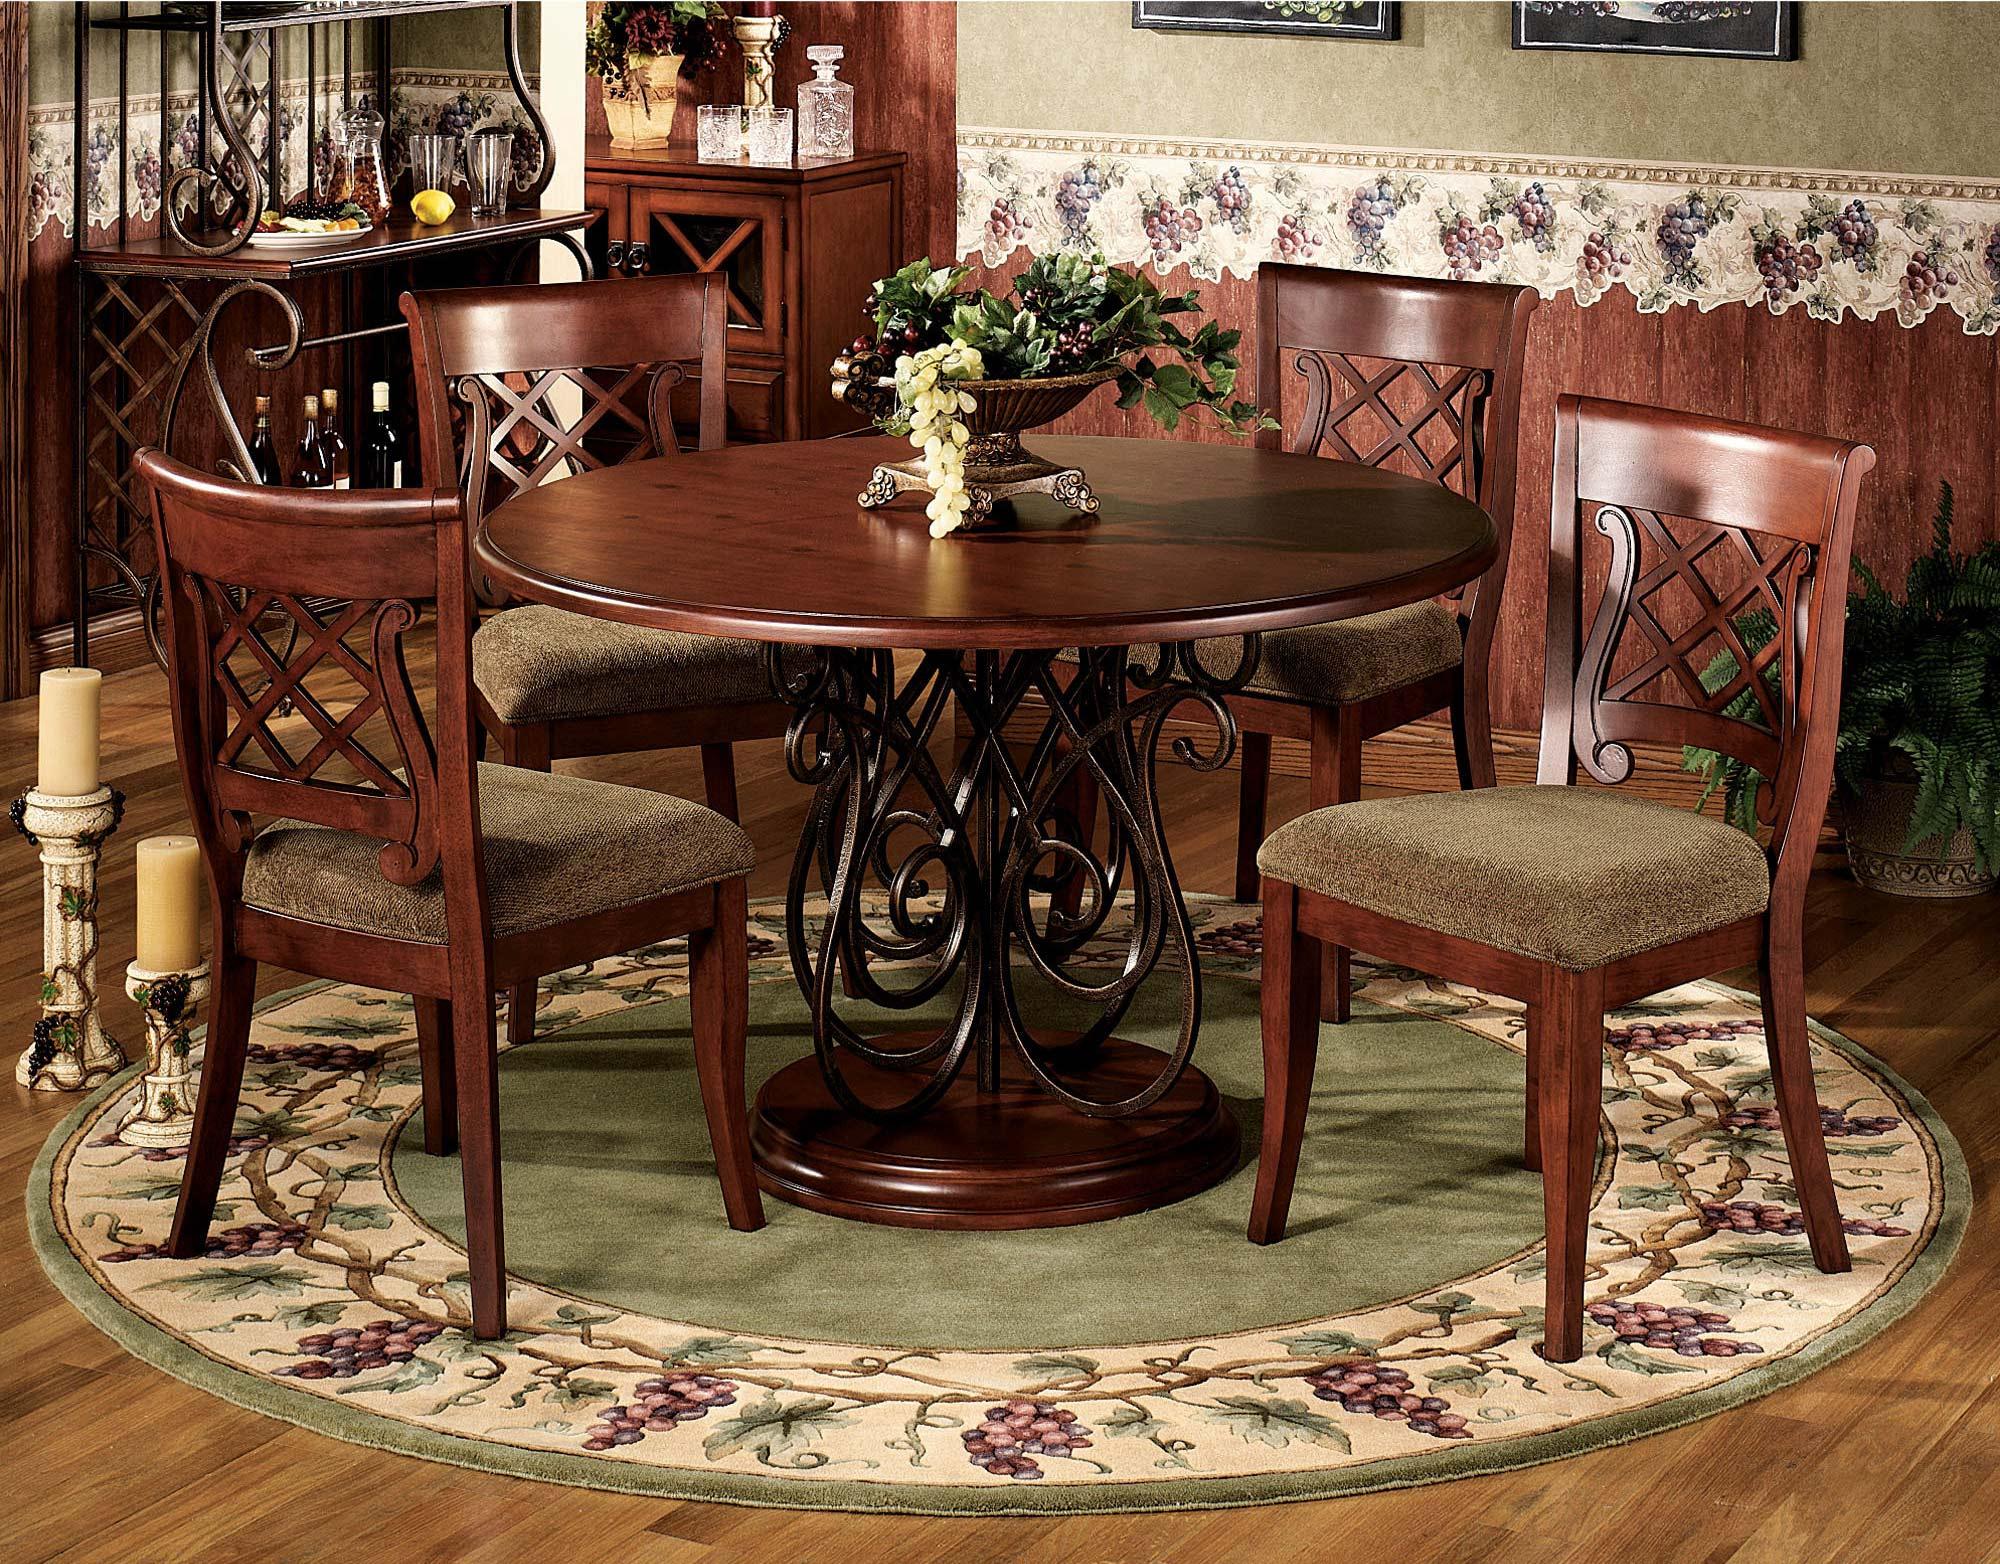 Area Rug Under Dining Table Ideas